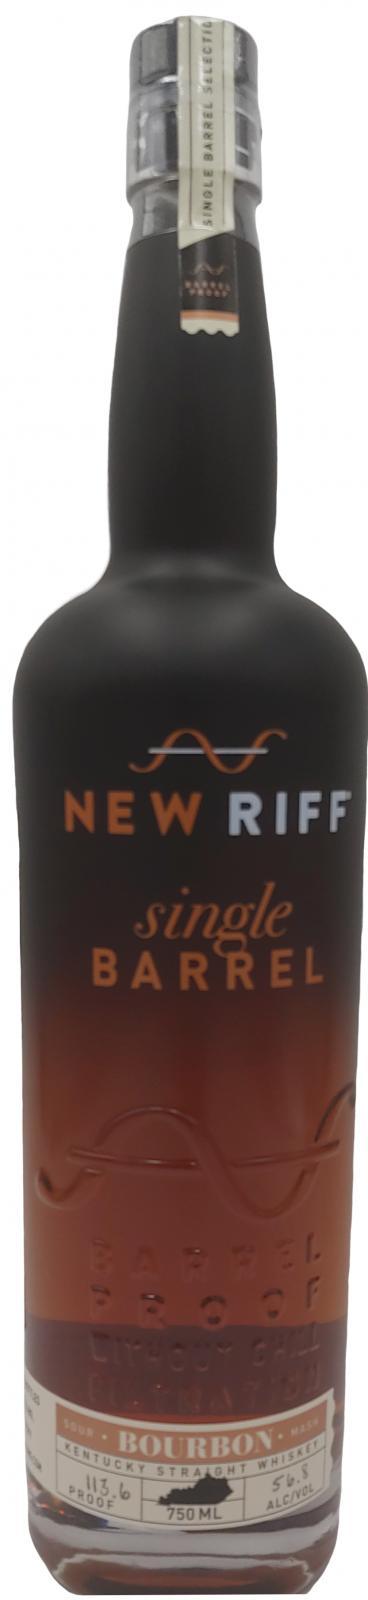 New Riff 2015